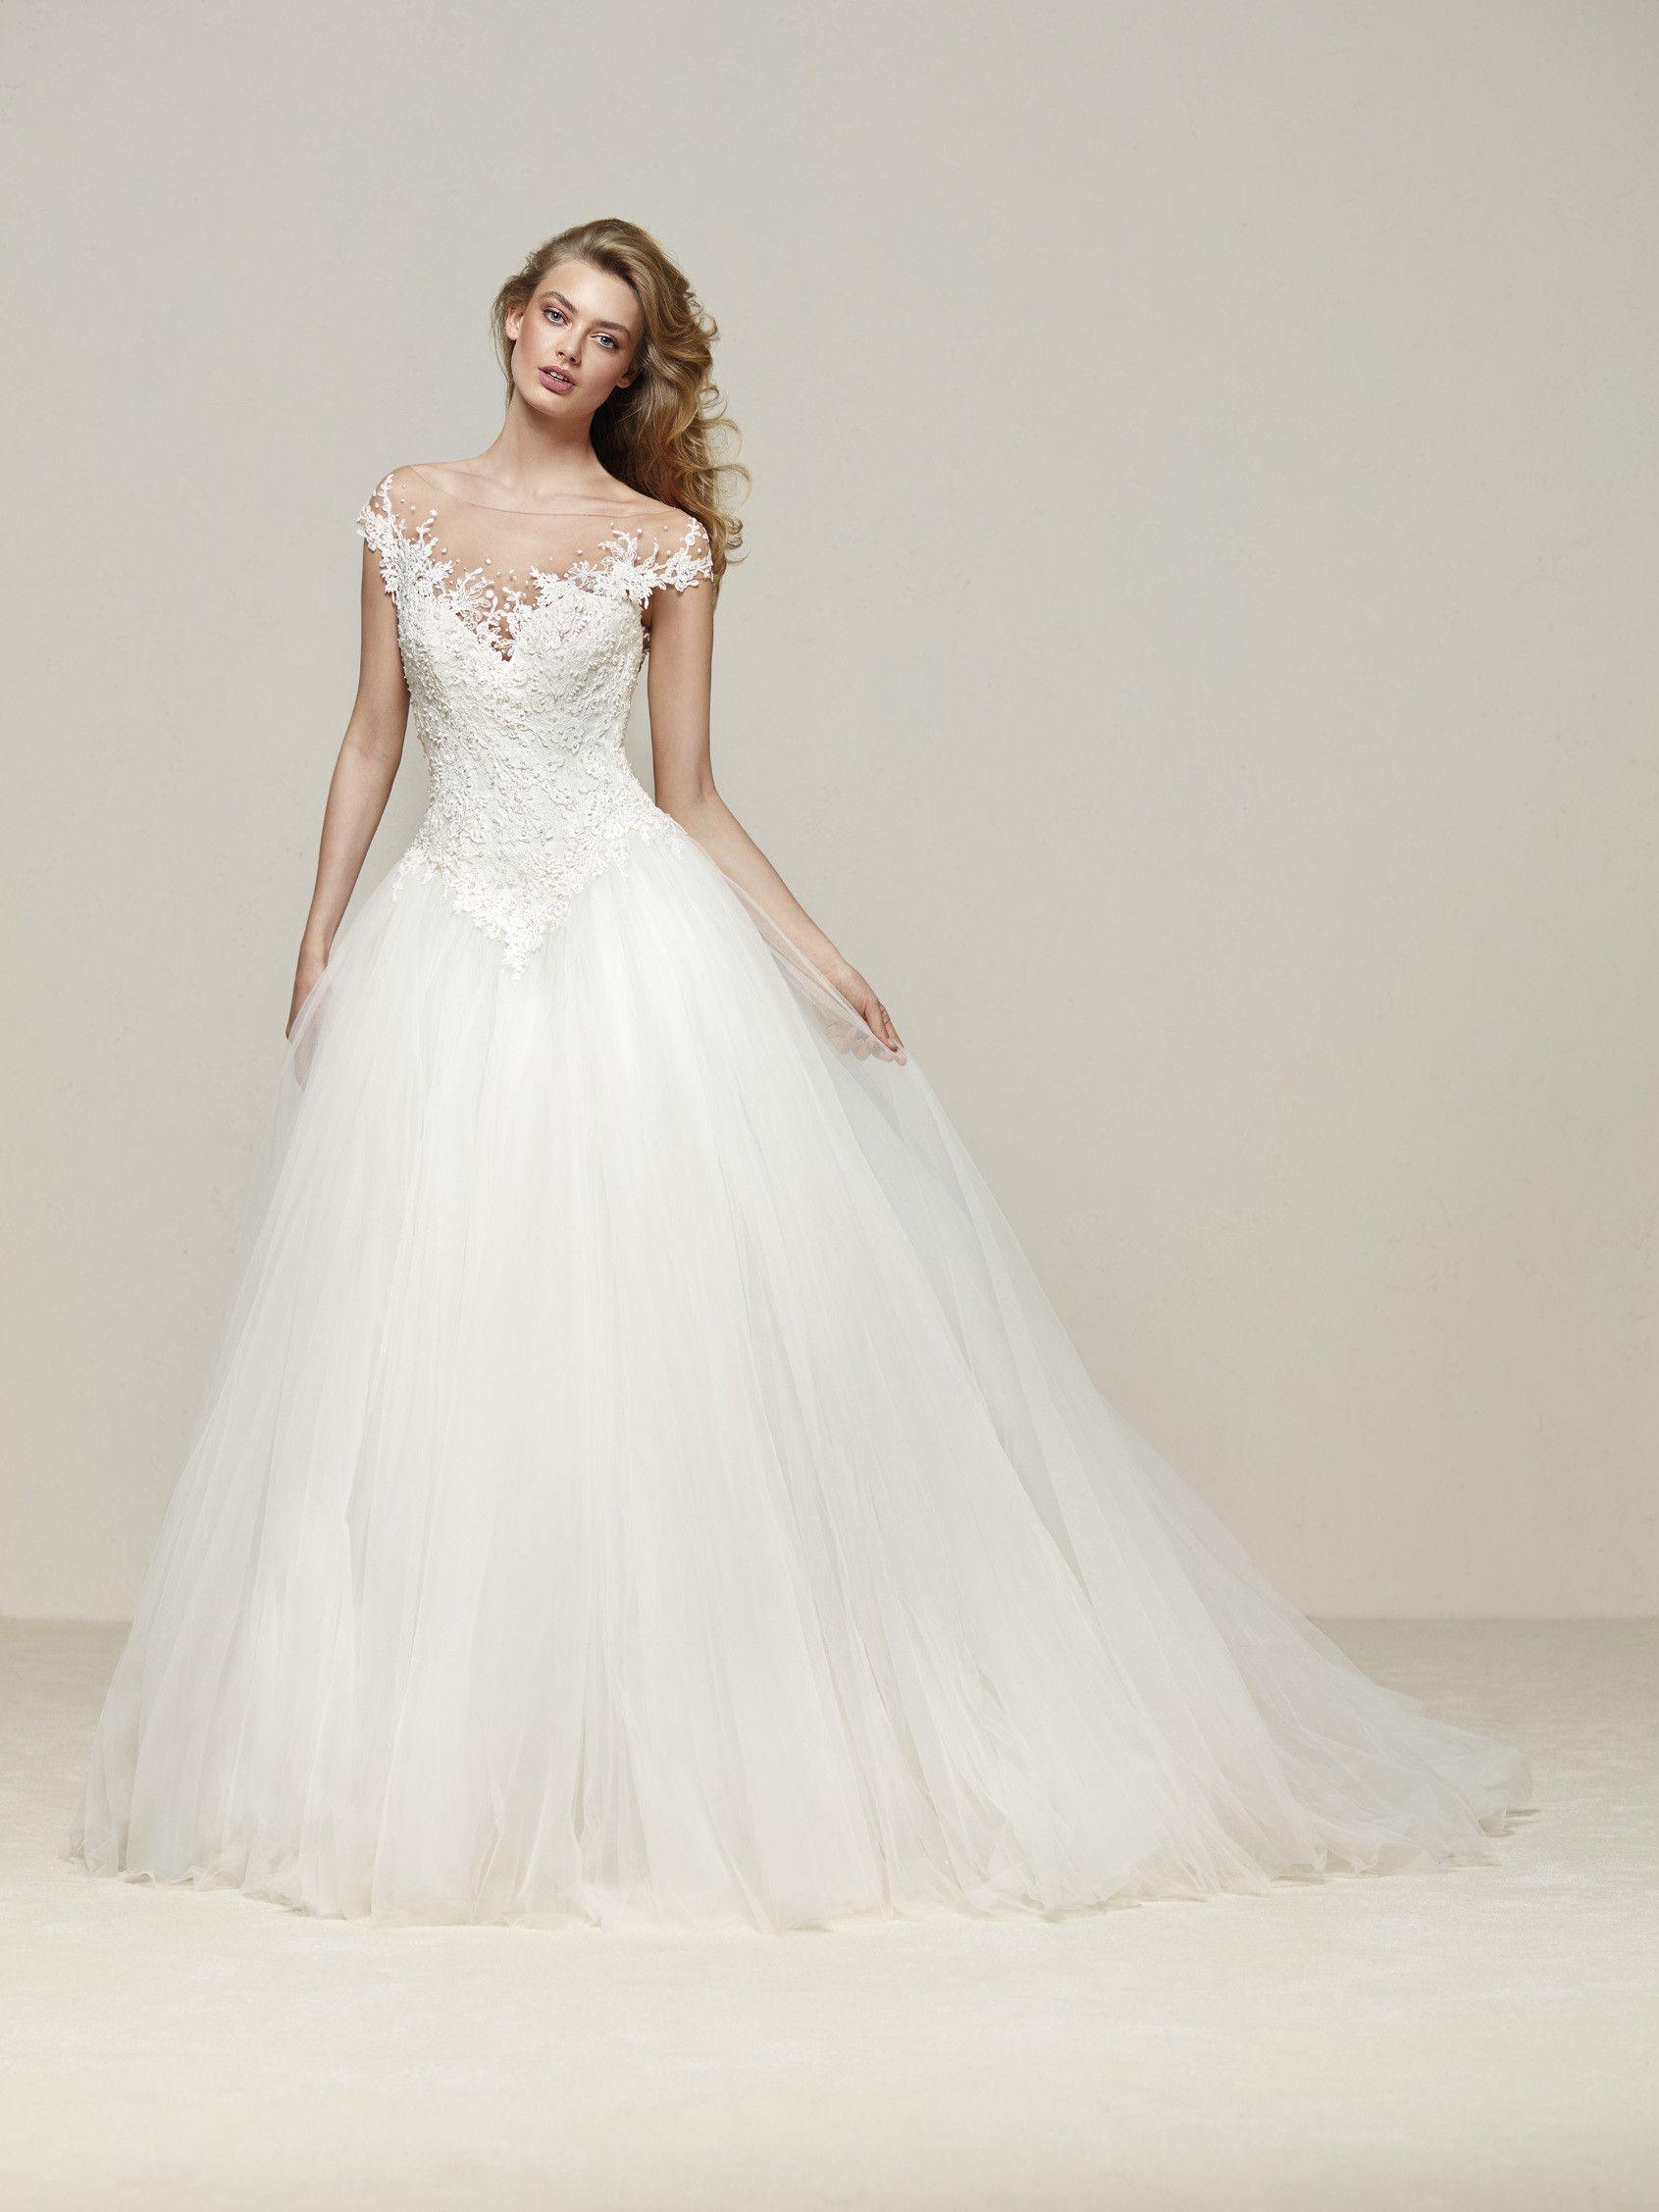 Brautkleid prinzessin drosel wedding pinterest princess